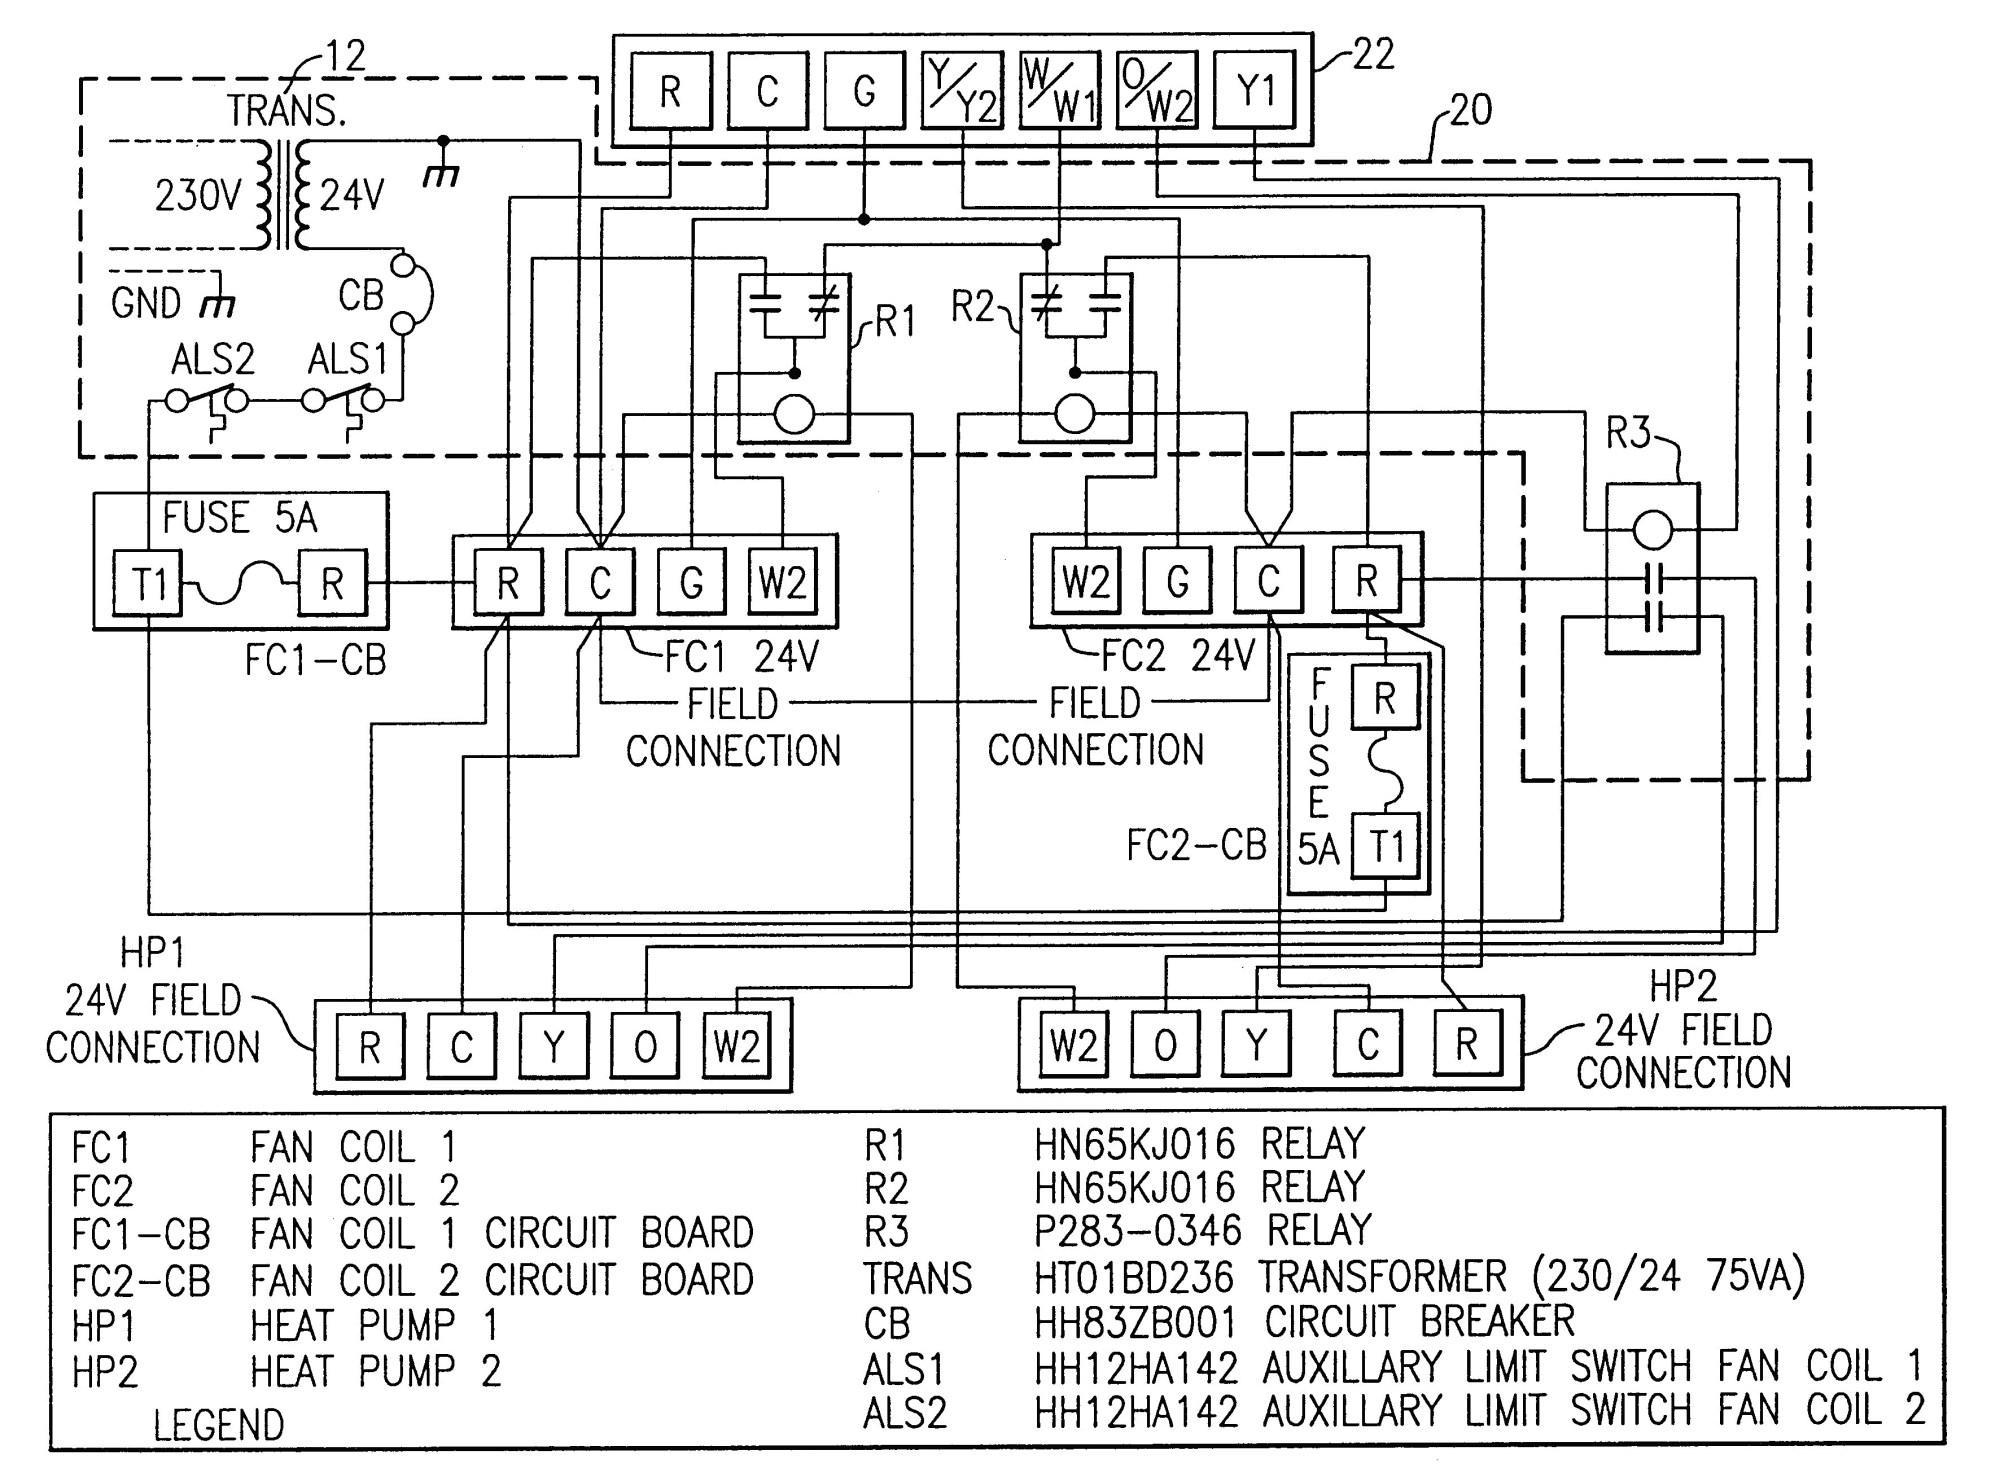 hight resolution of american standard air conditioner wiring diagram wiring diagram rh 13 12 14 jacobwinterstein com american standard telecaster wiring diagram fender